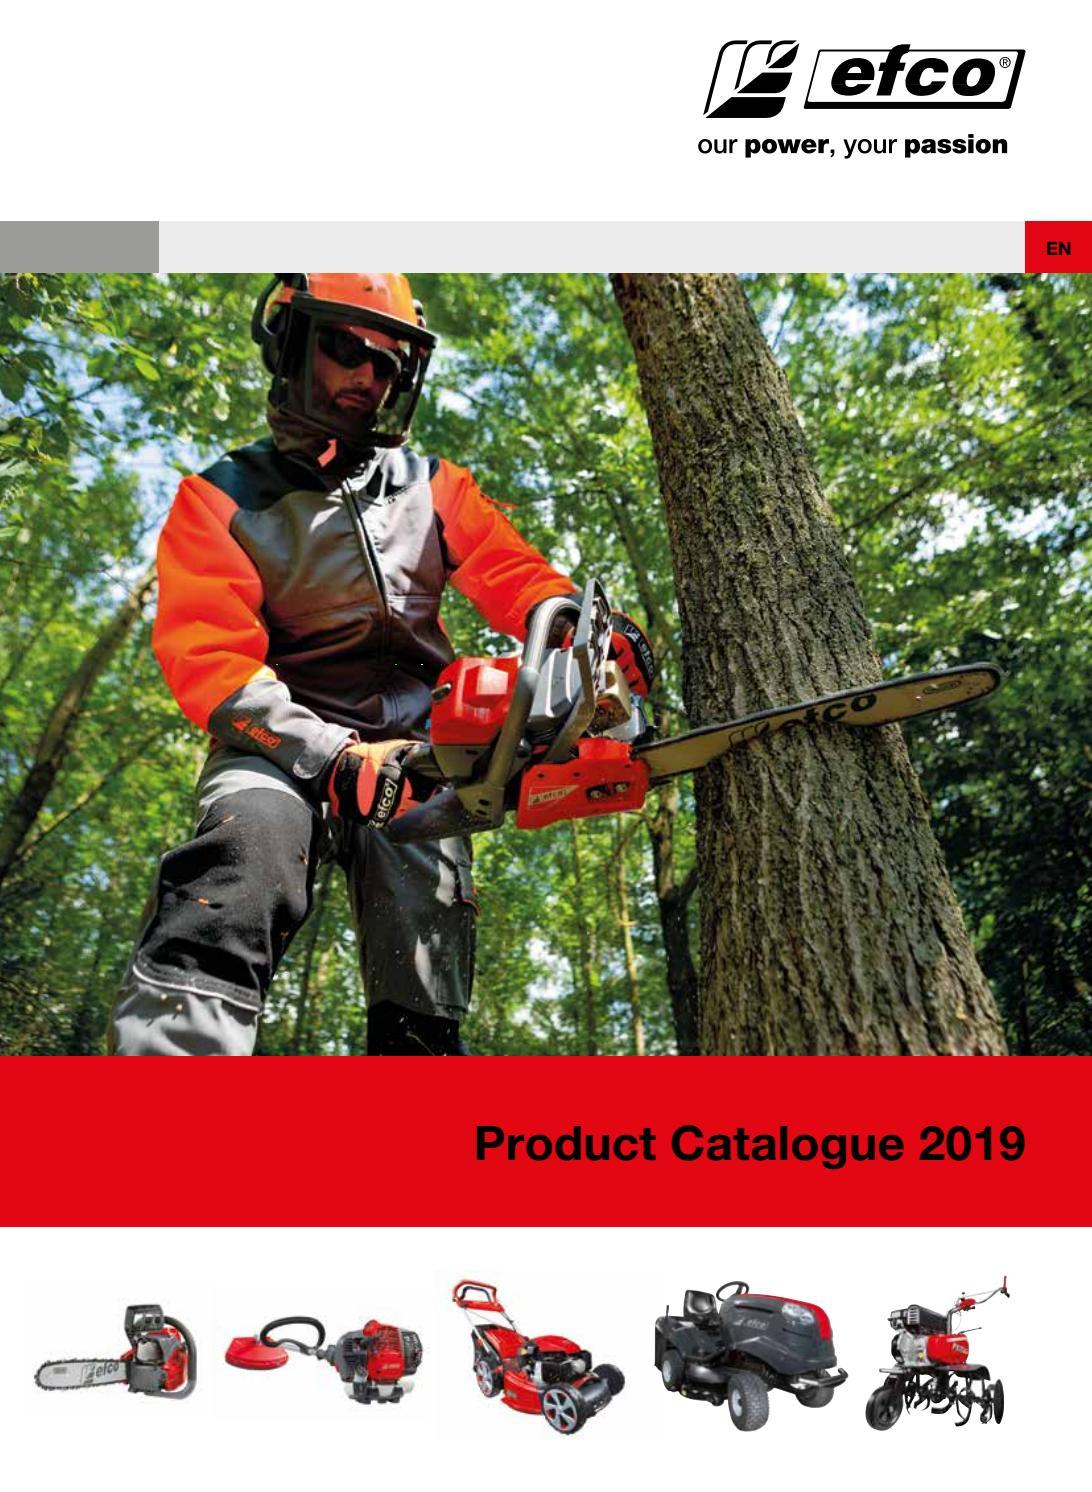 Efco Balls untreated Wood with Hole 6 mm /ø 2 mm 150 pcs